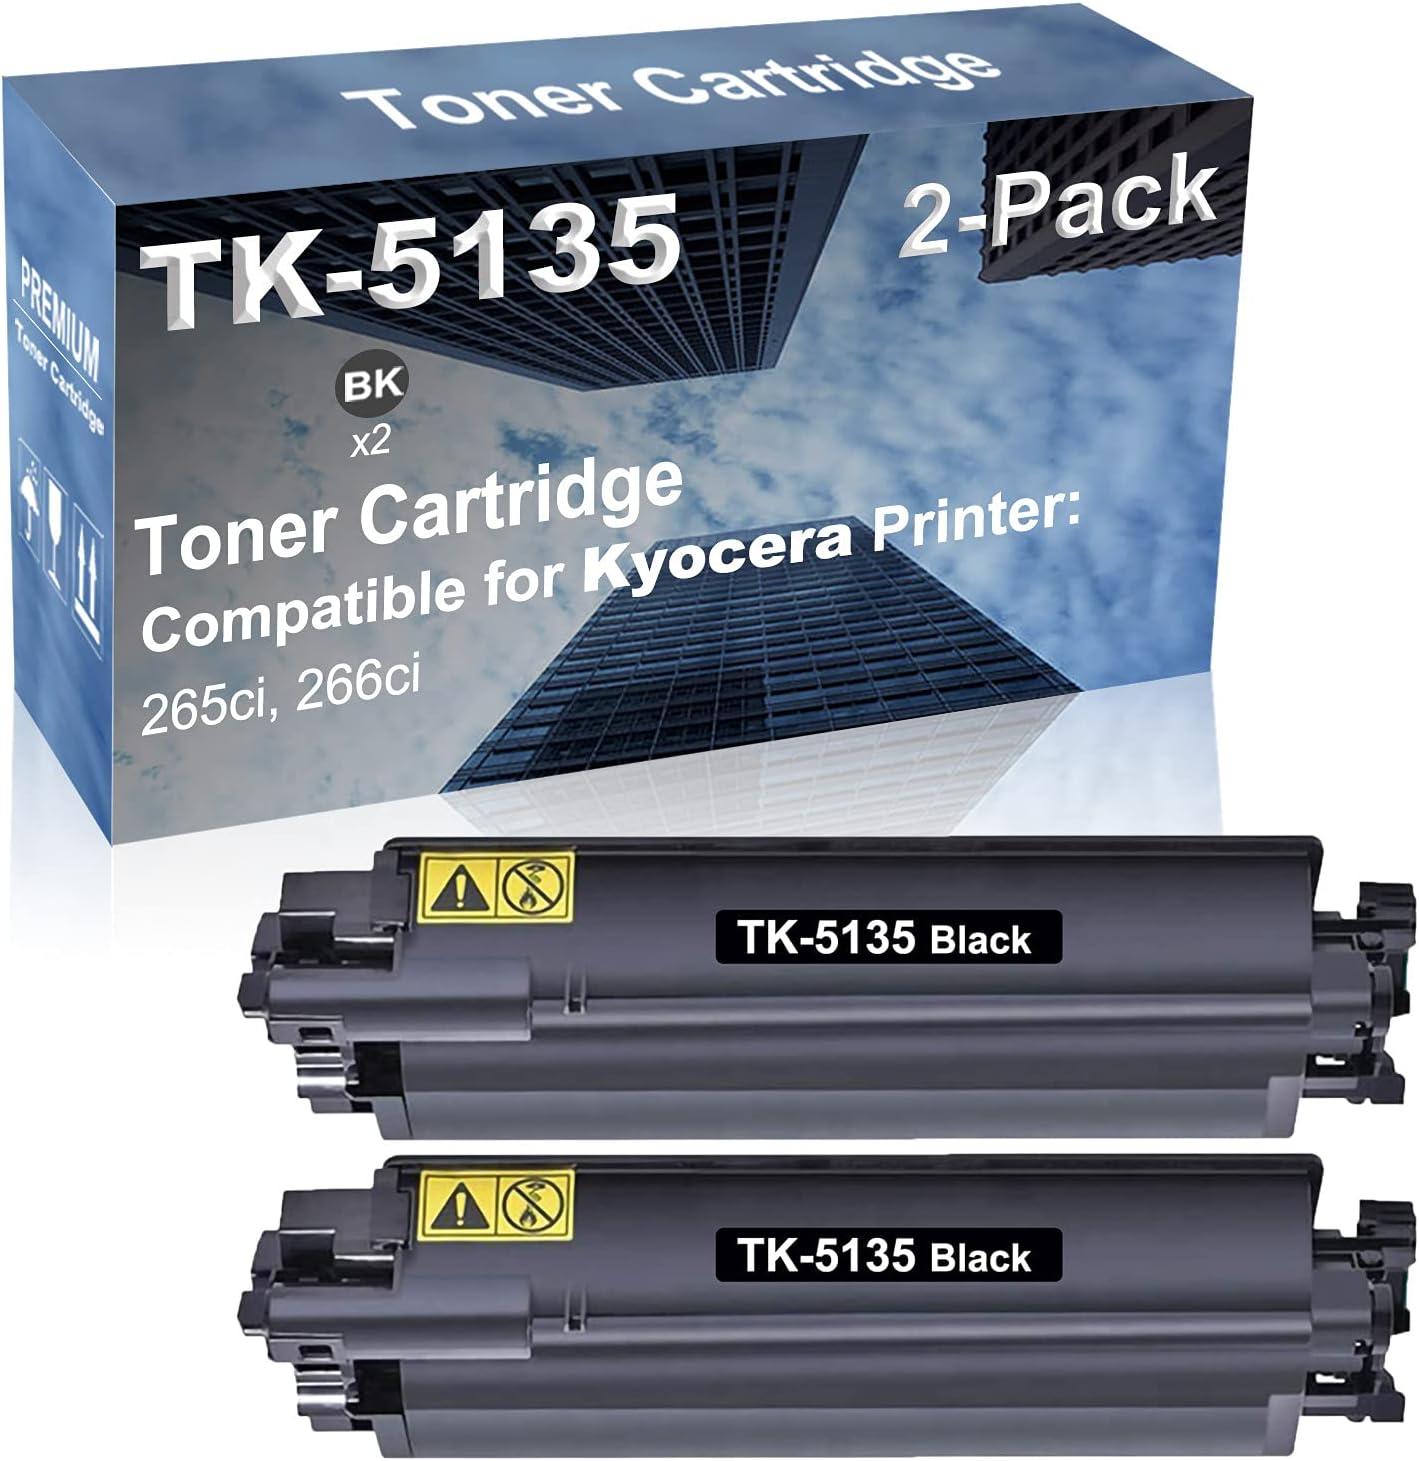 2-Pack (Black) Compatible 265ci, 266ci Printer Toner Cartridge High Capacity Replacement for Kyocera TK-5135 (TK-5135BK) Toner Cartridge